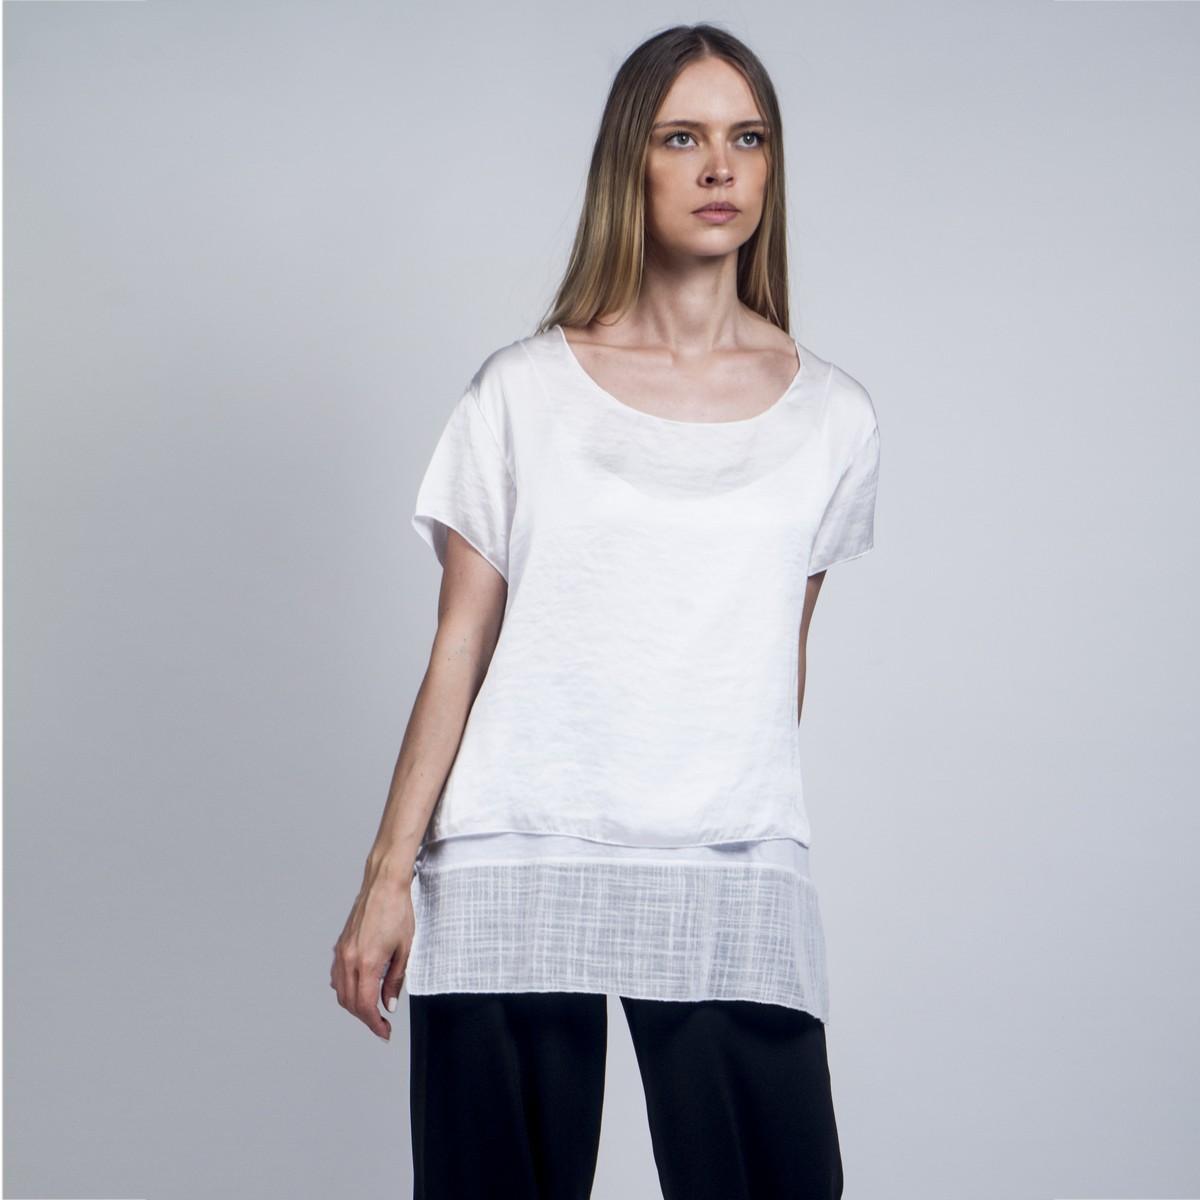 1ce288aa194e Σατέν μπλούζα με εσωτερικό τοπ - Γυναικεία Ρούχα - Φορέματα - Xanashop